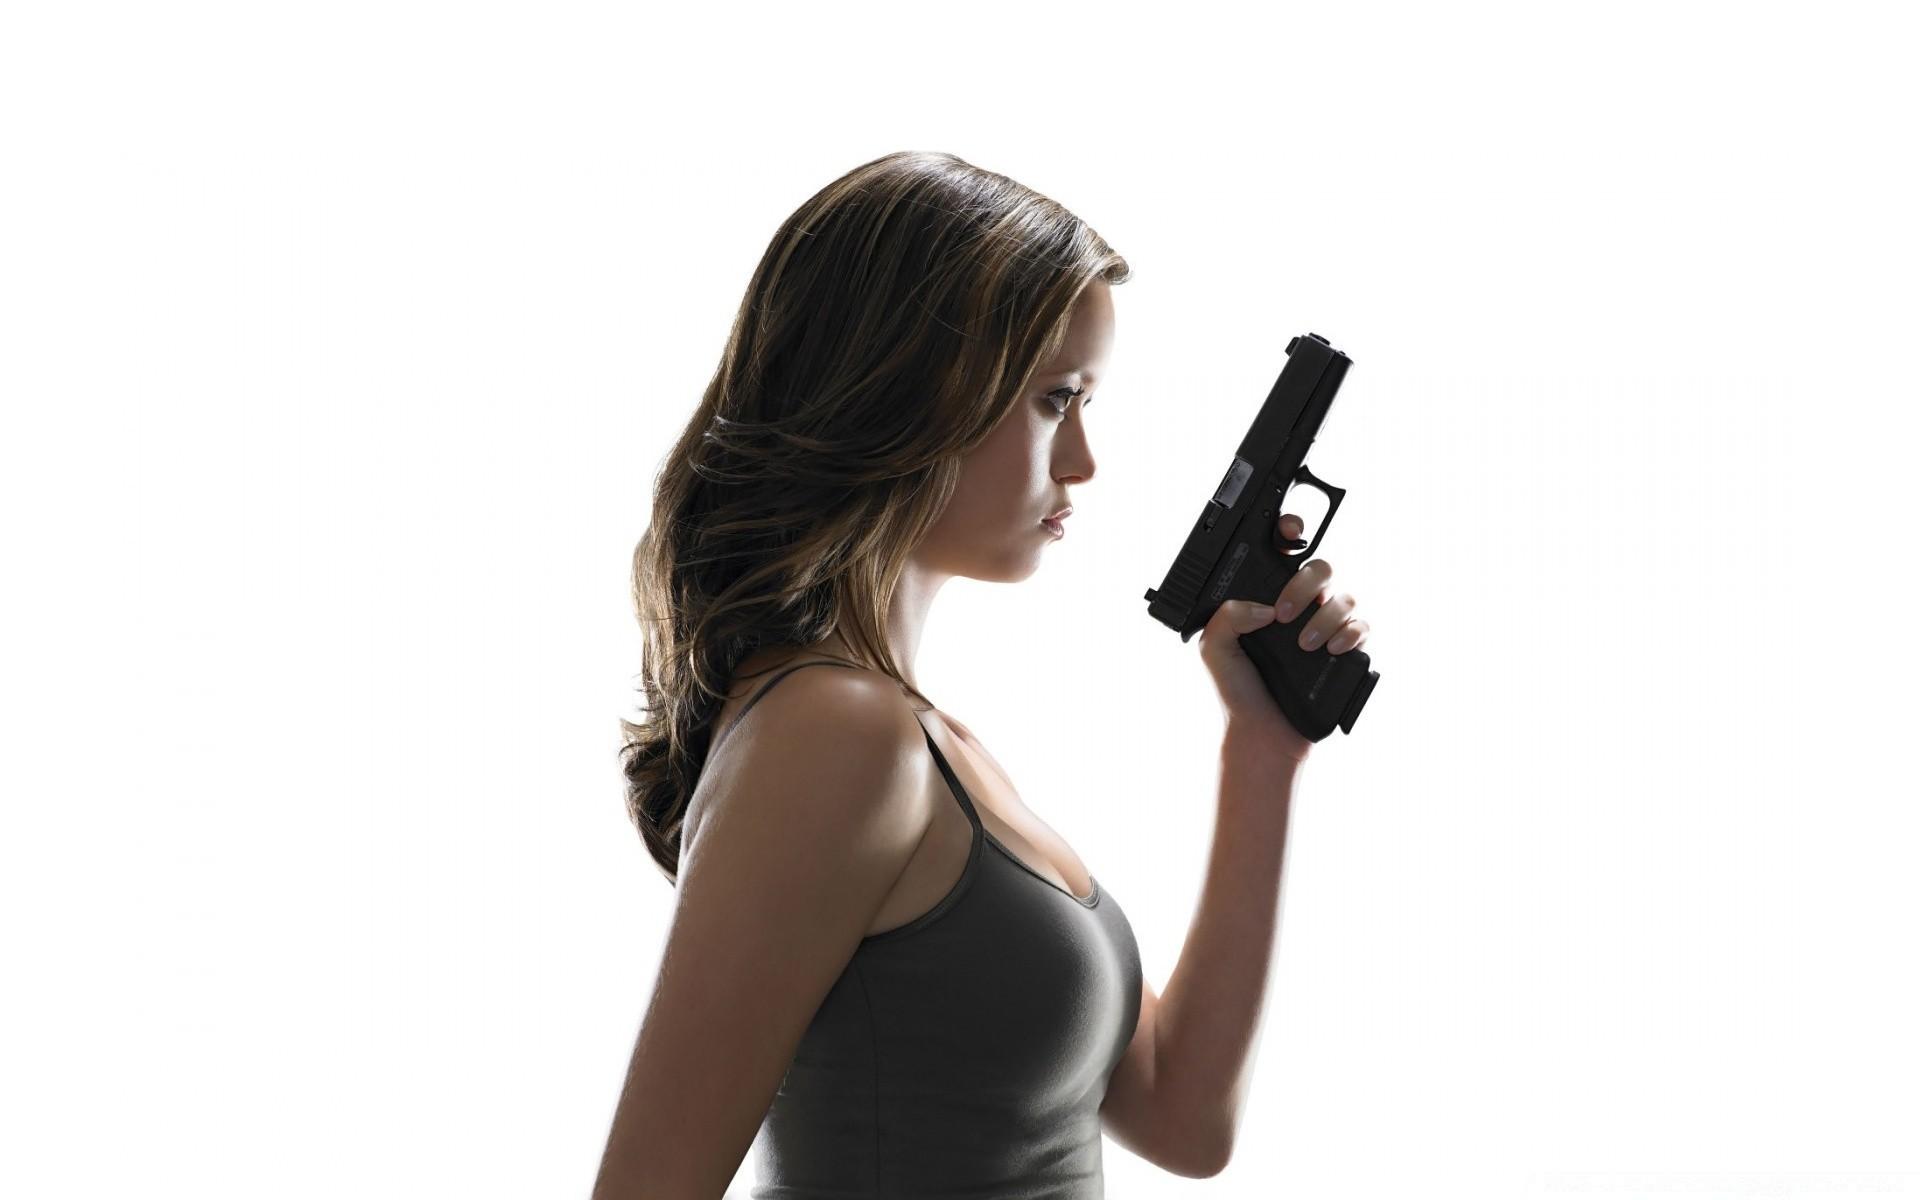 Картинки, картинки девушки с пистолетом с надписями